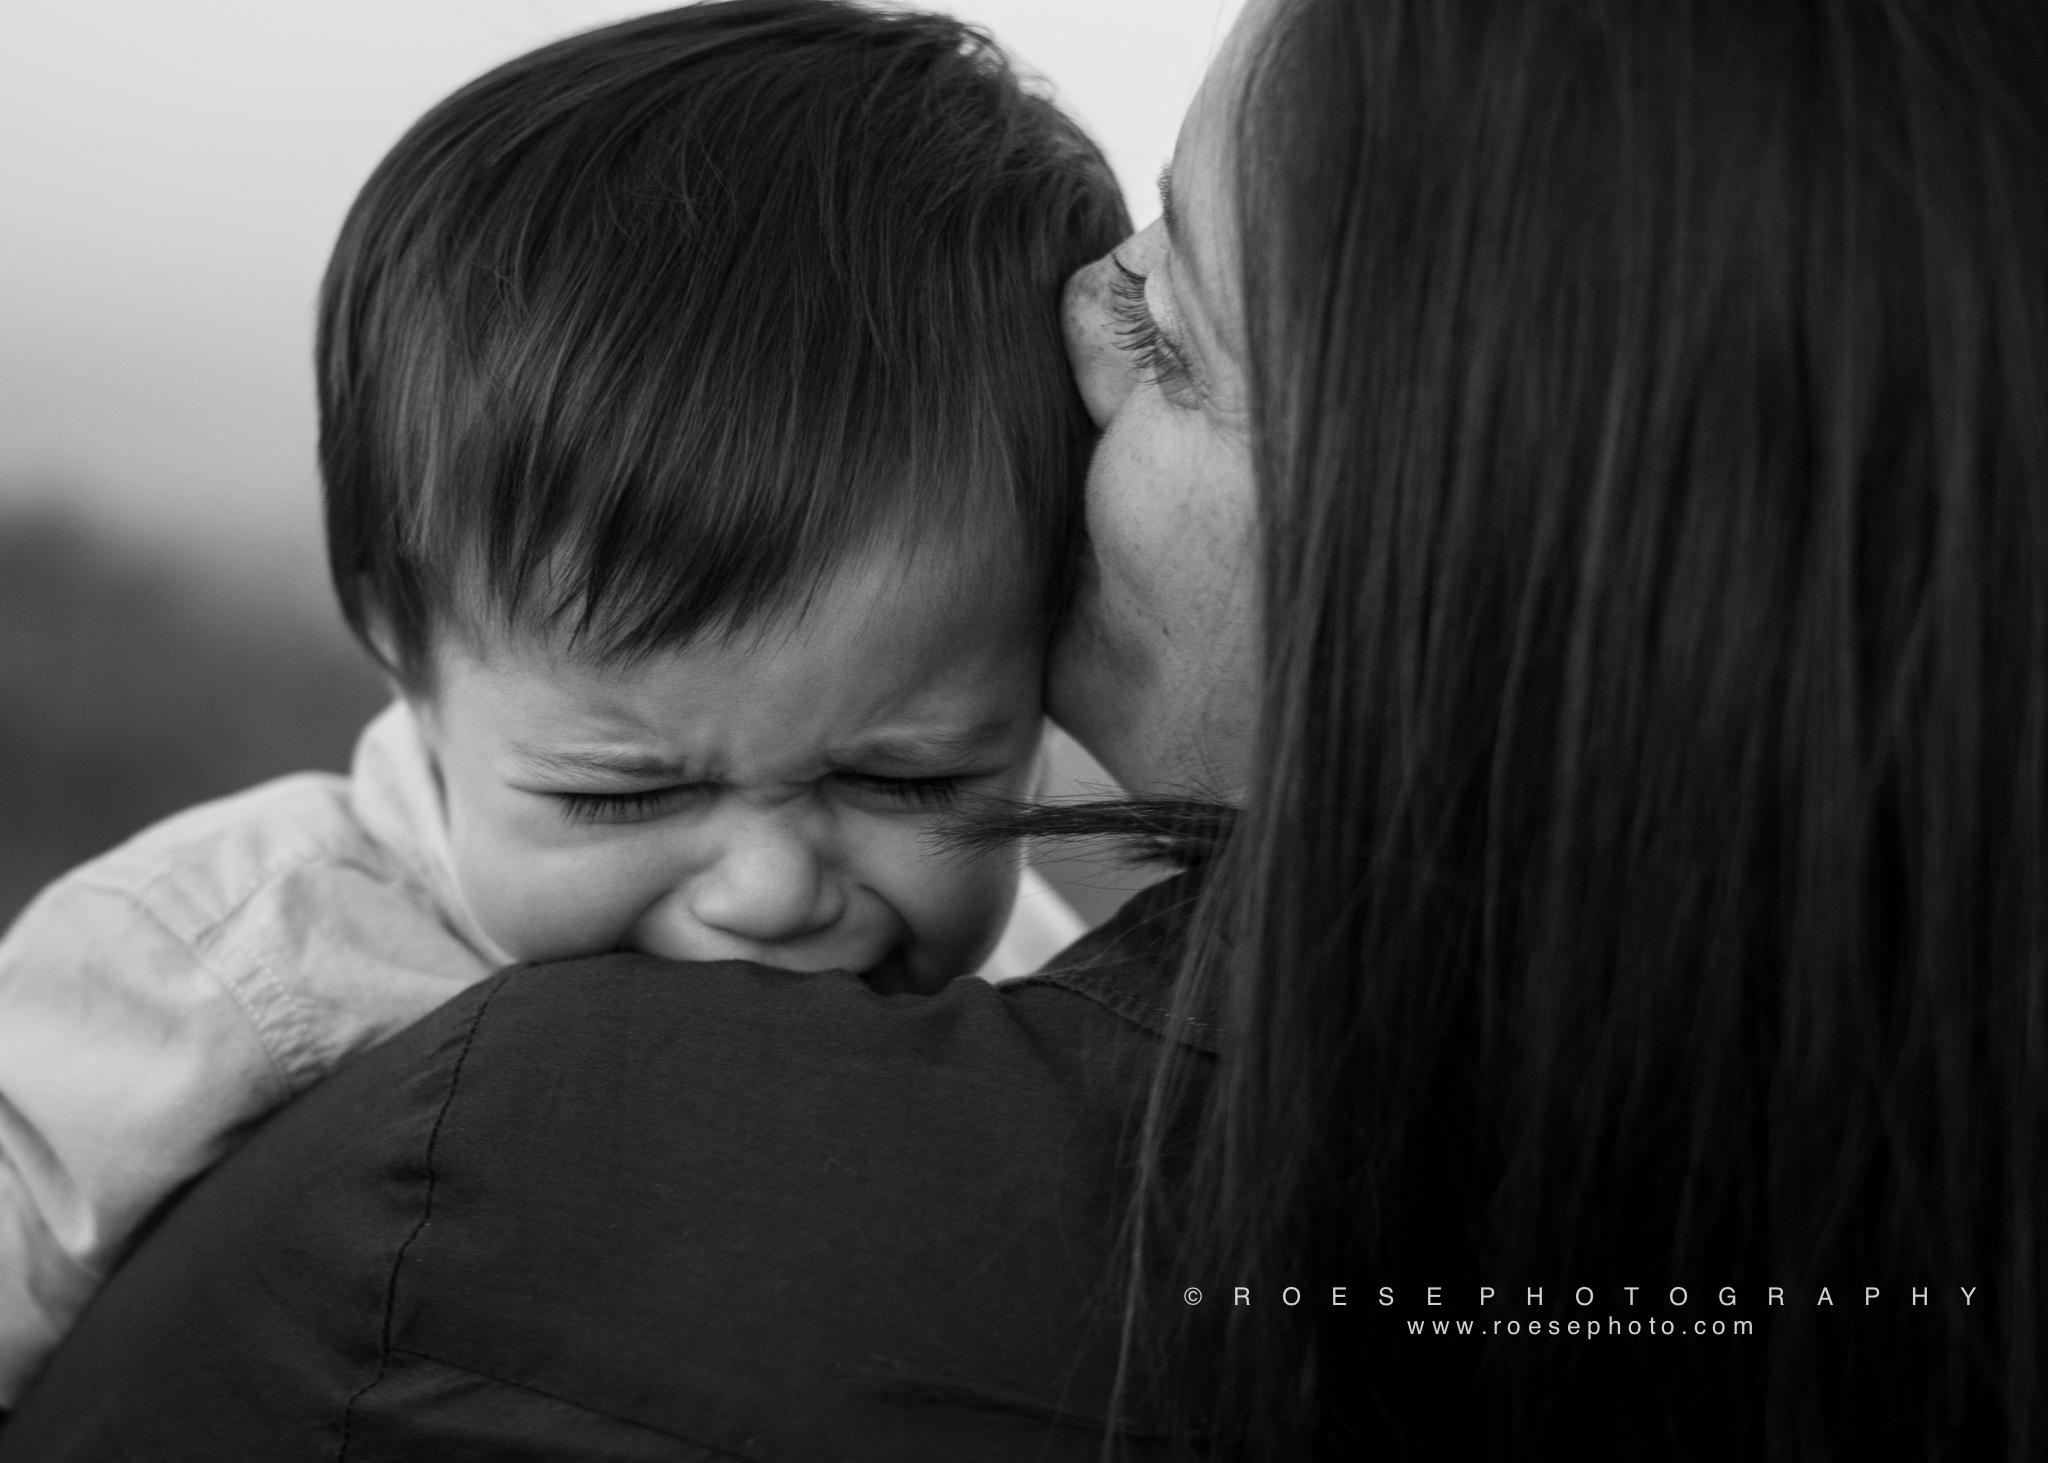 C.-Roese-Ramp-Roese-Photography-LLC.-Bennett-Family-29.jpg